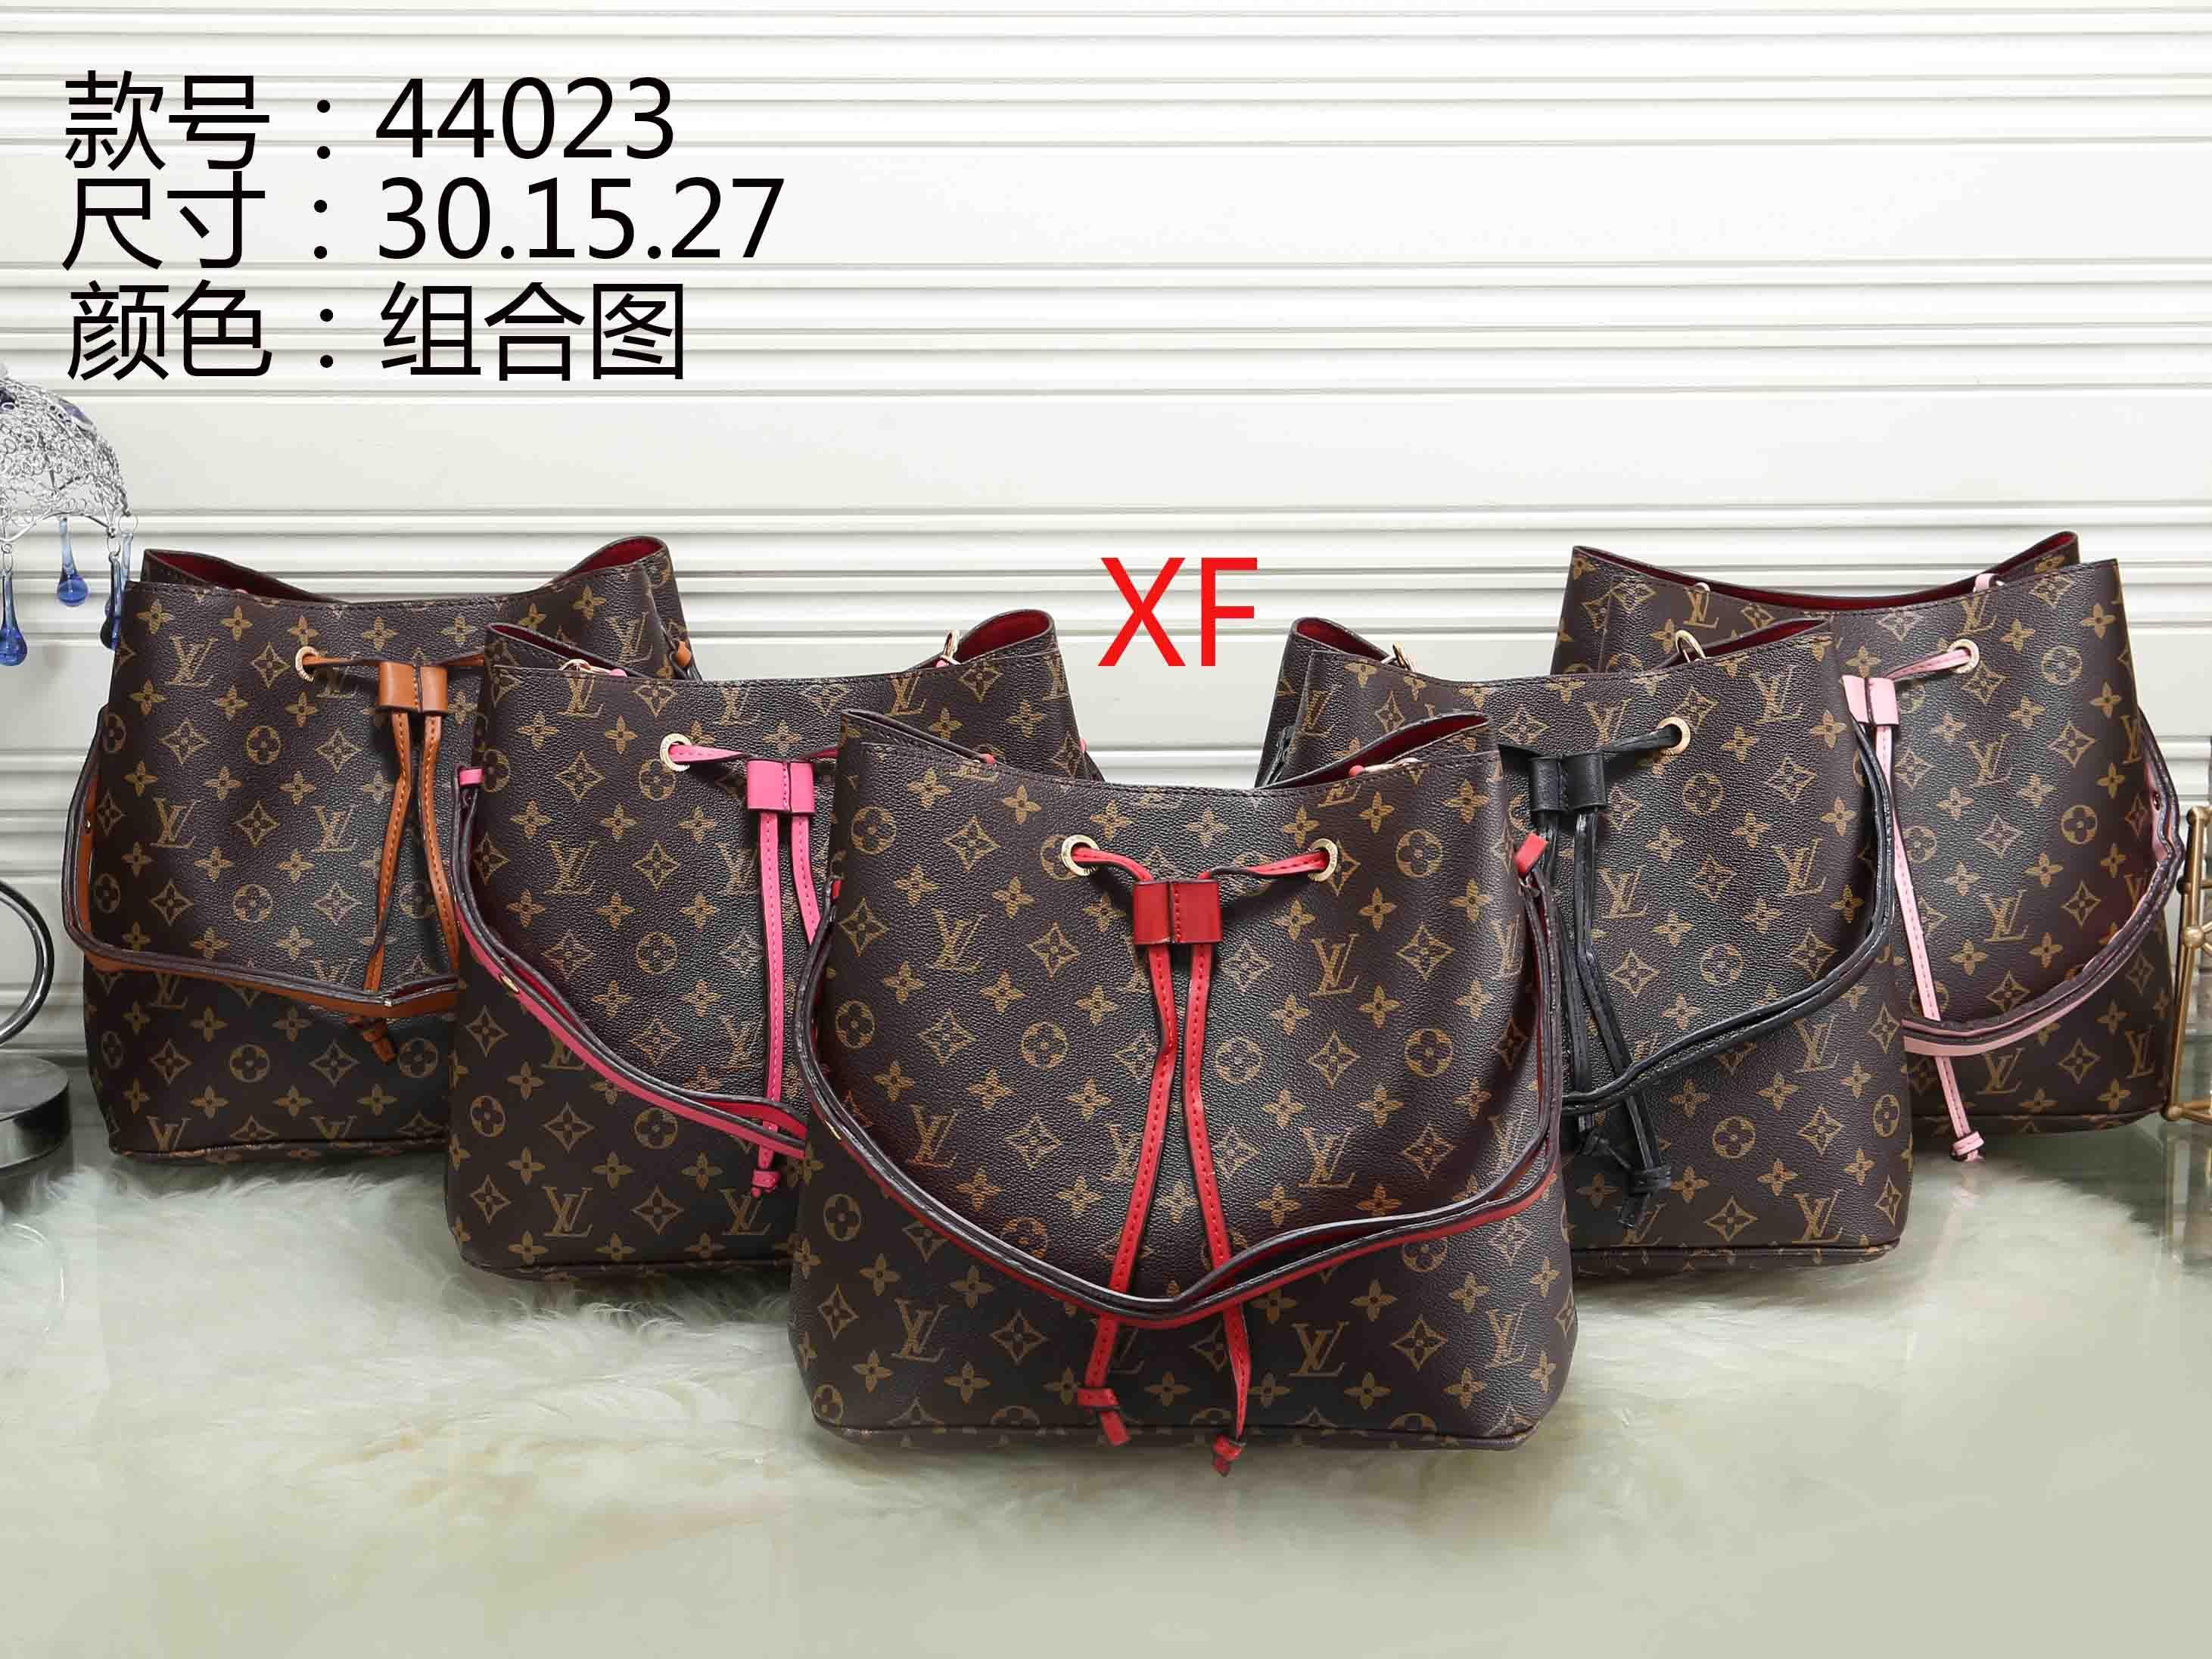 399c5478141 Famous Shoulder Bags Women Luxury Brand Real Leather Chain Crossbody Bag  Handbags Famous Circle Designer Purse High Quality Female Crossbags Women  Handbags ...